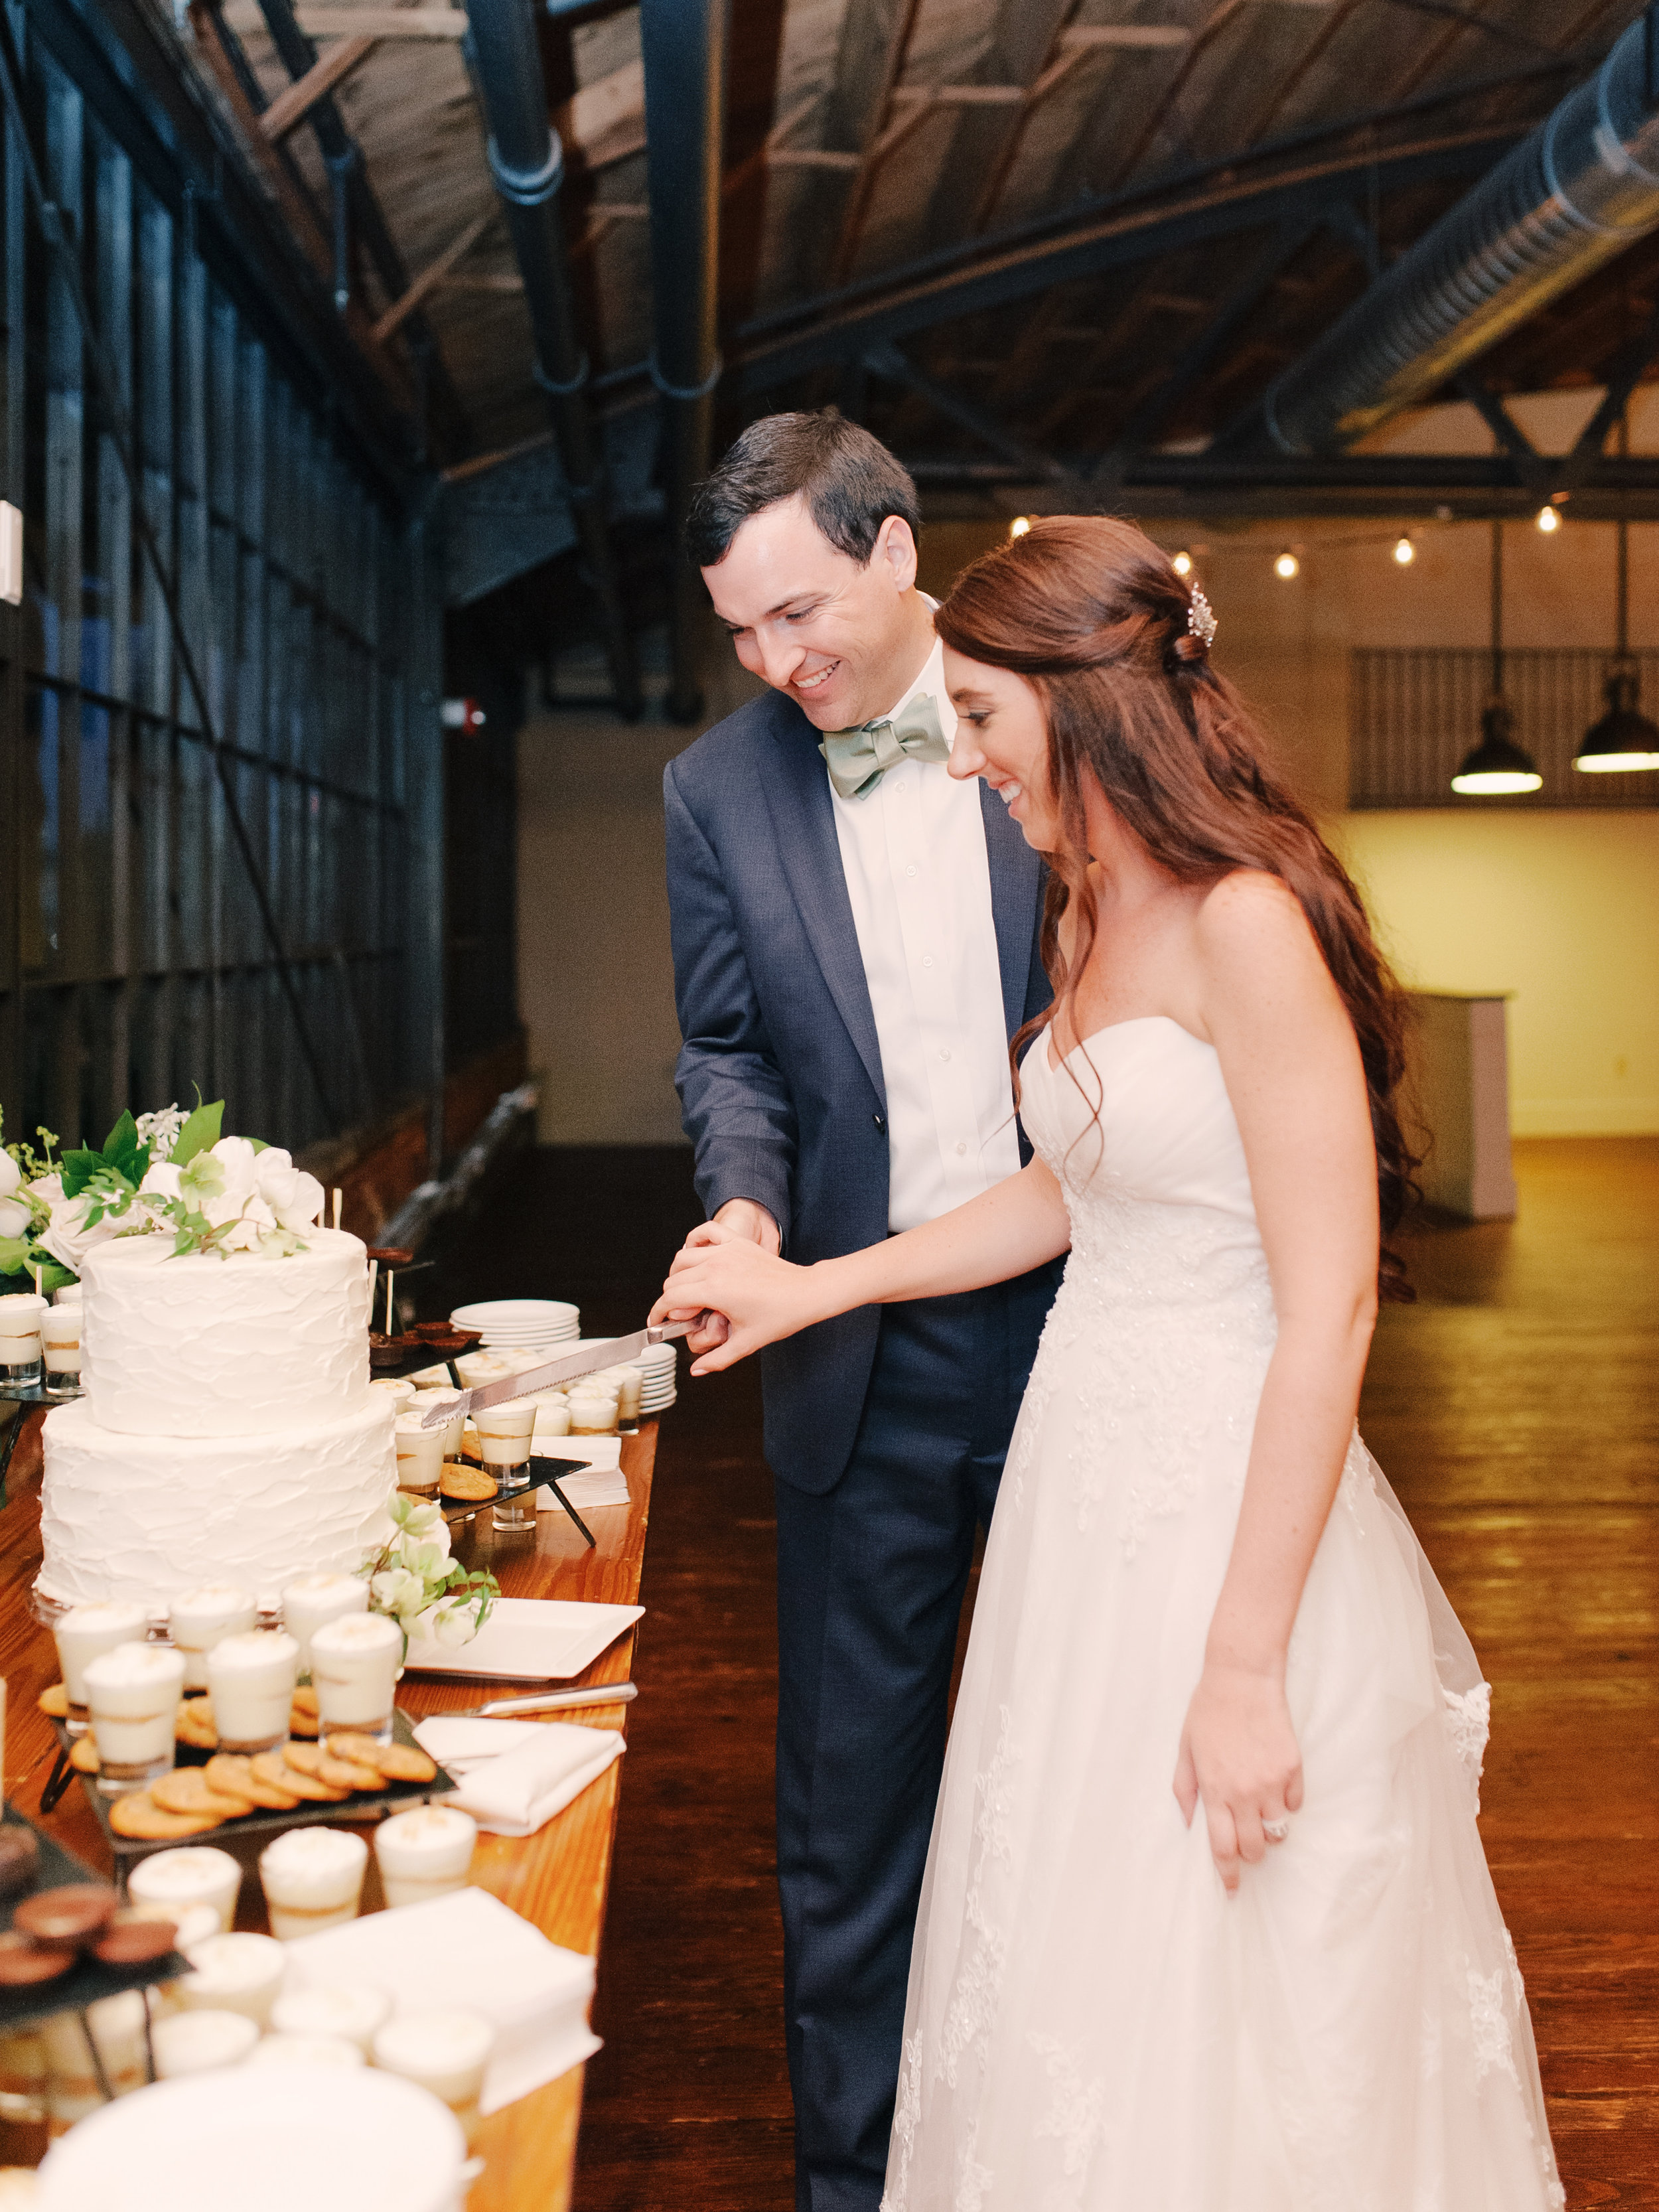 Romantic-Summerour-studio-wedding-hannah-forsberg-atlanta-wedding-photographer64.JPG